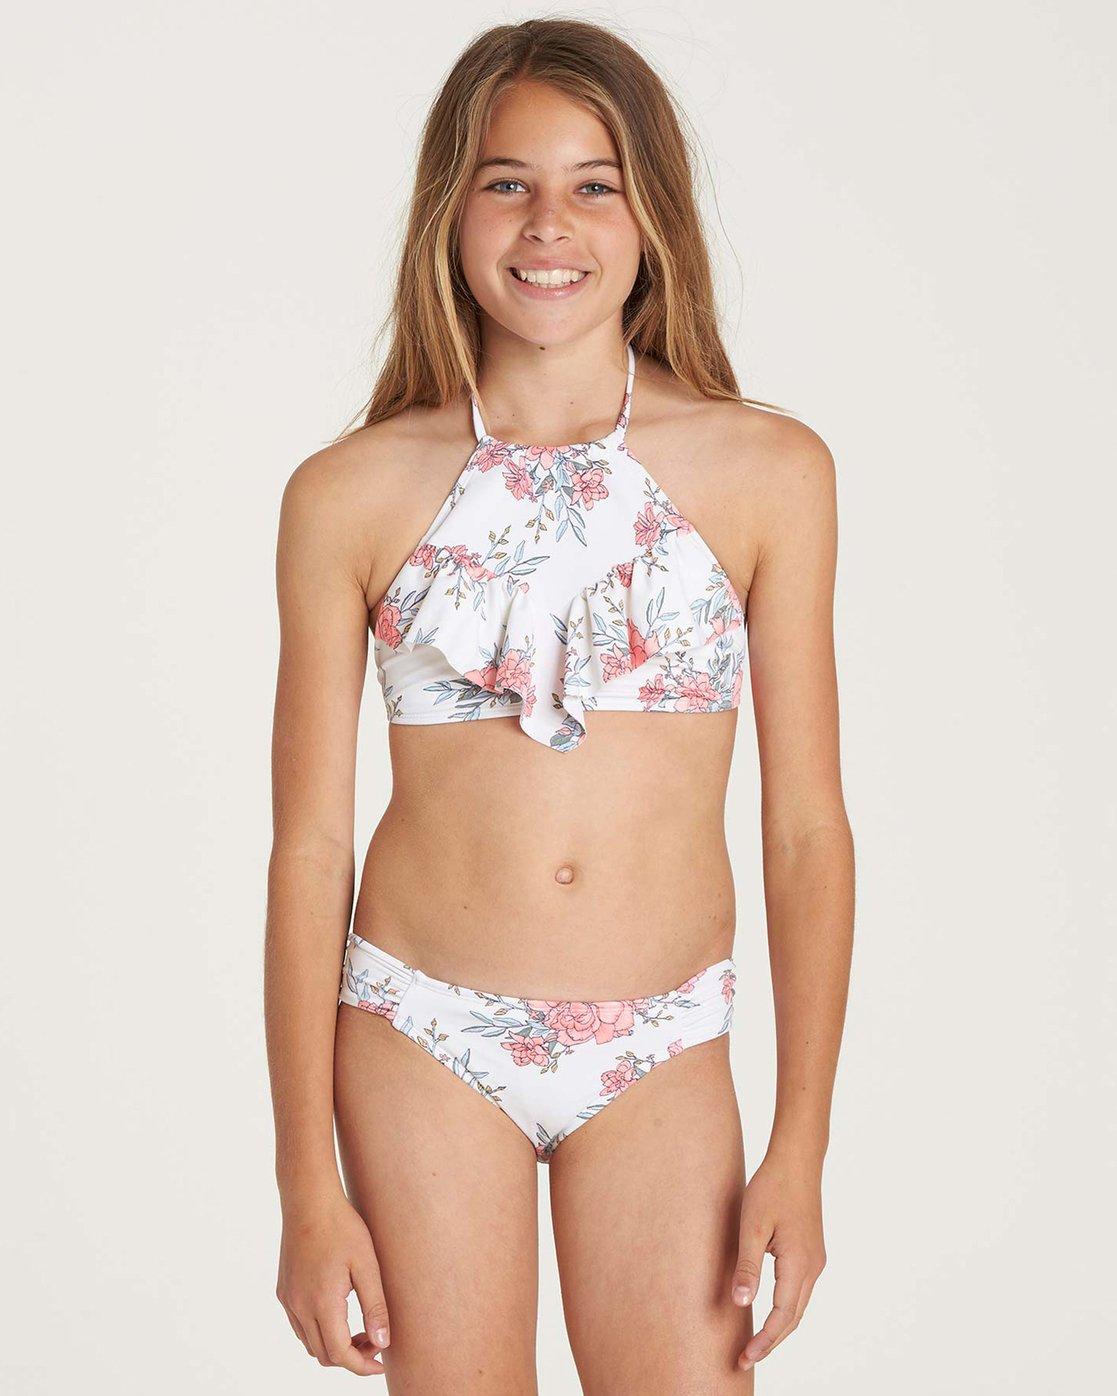 Man shower pre pubesent girls in bikini bridgette